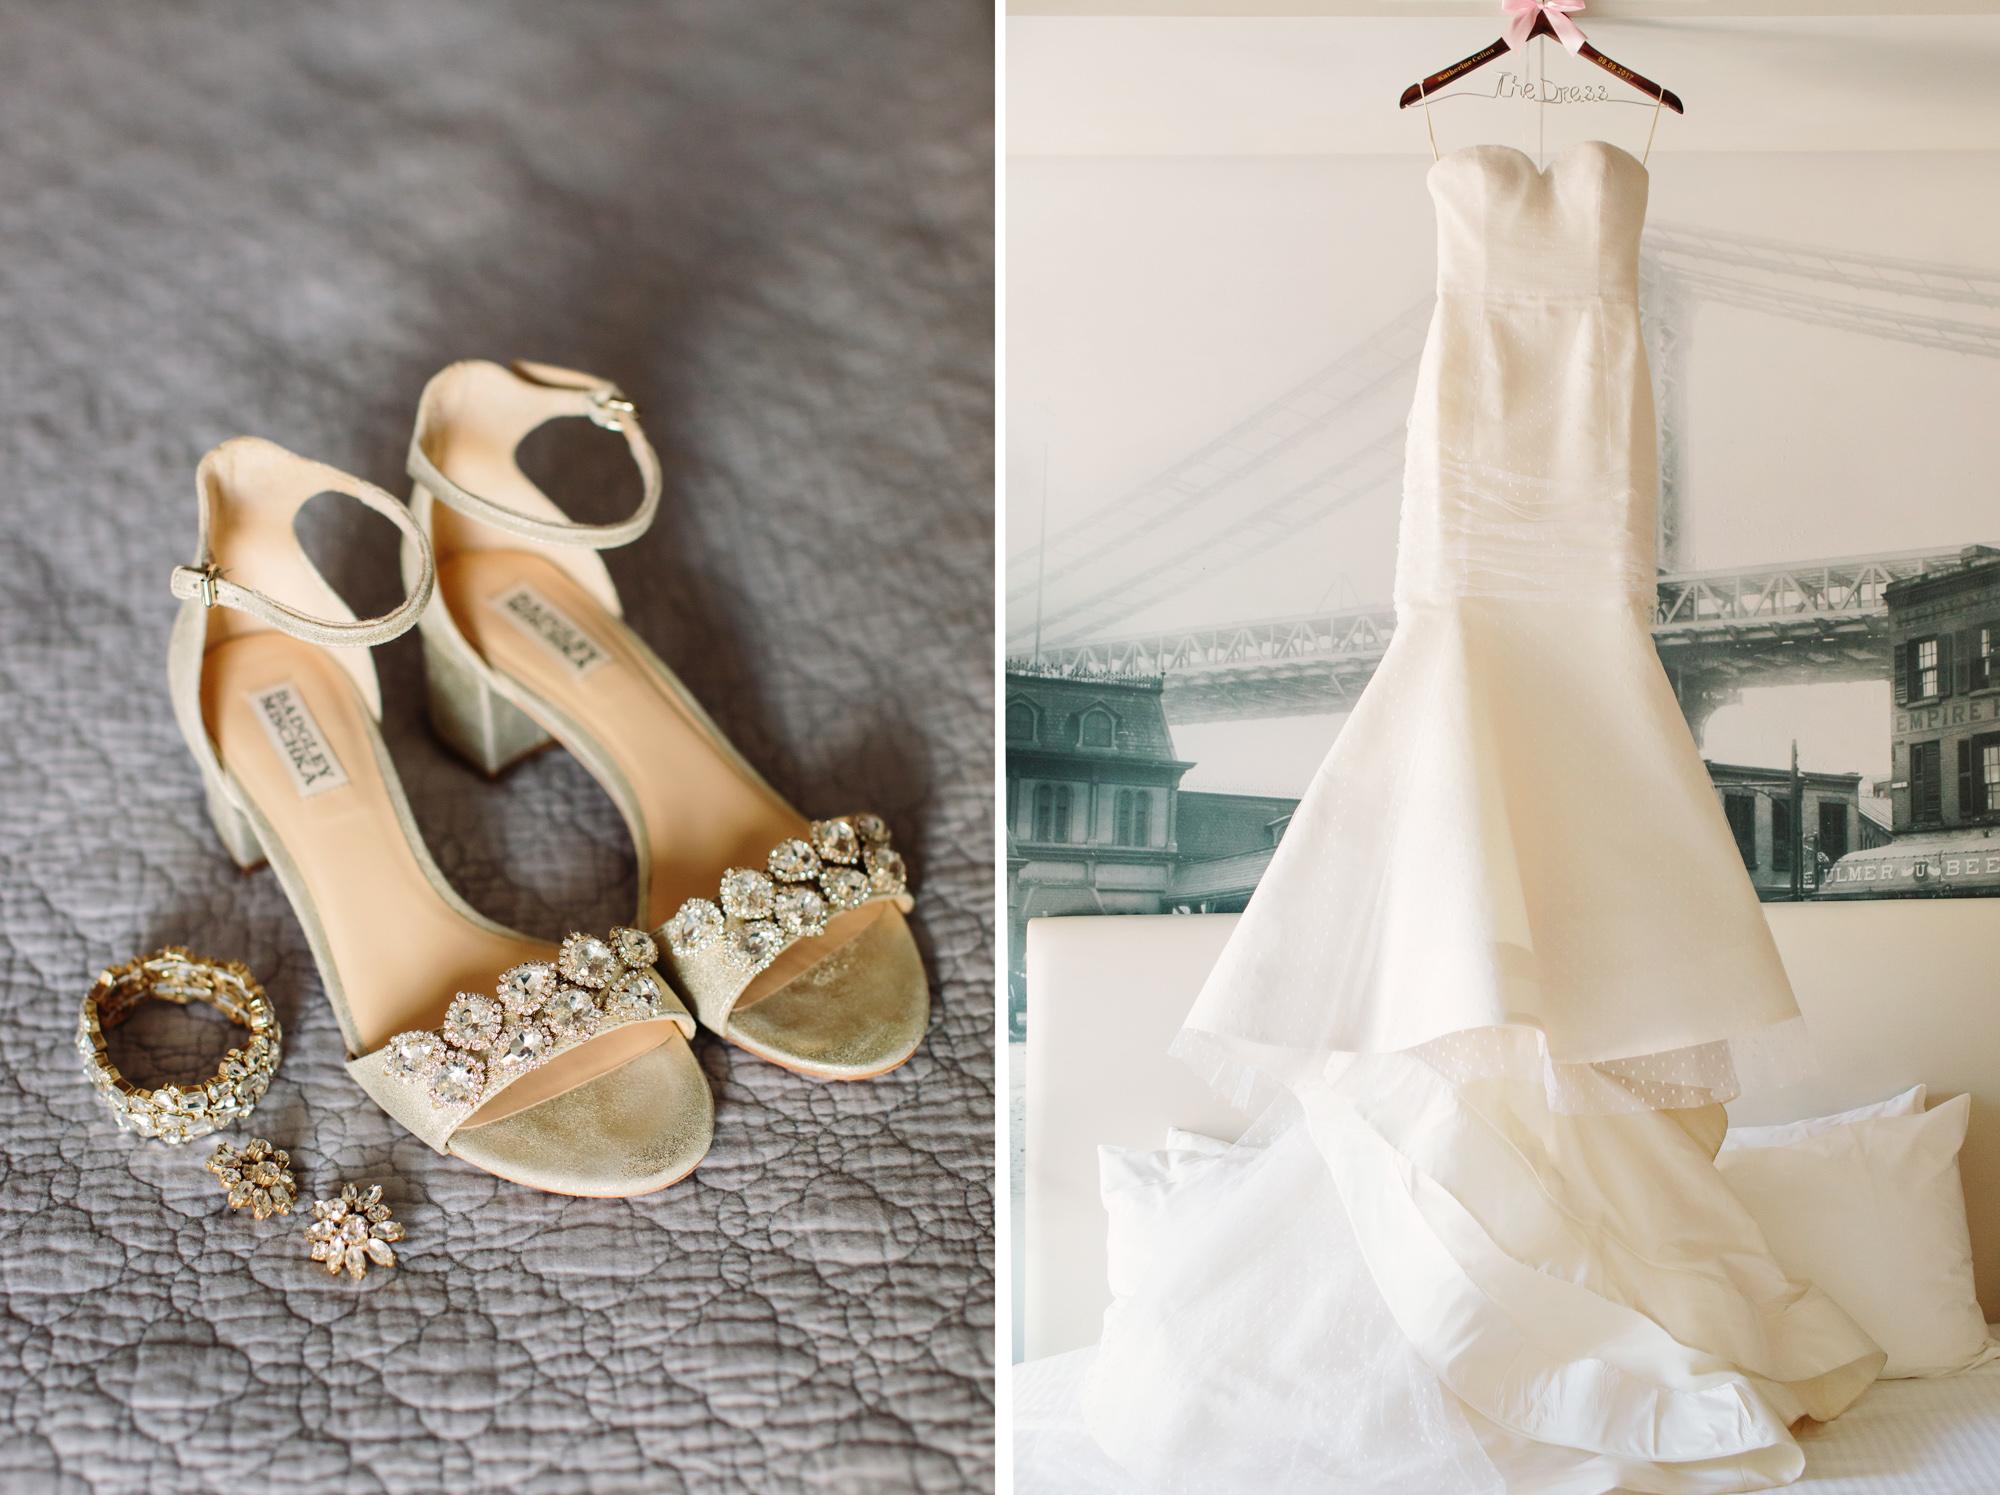 04_Kate_Sam_Picnic_House_Wedding_Brooklyn_NY_Tanya_Salazar_Photography.jpg